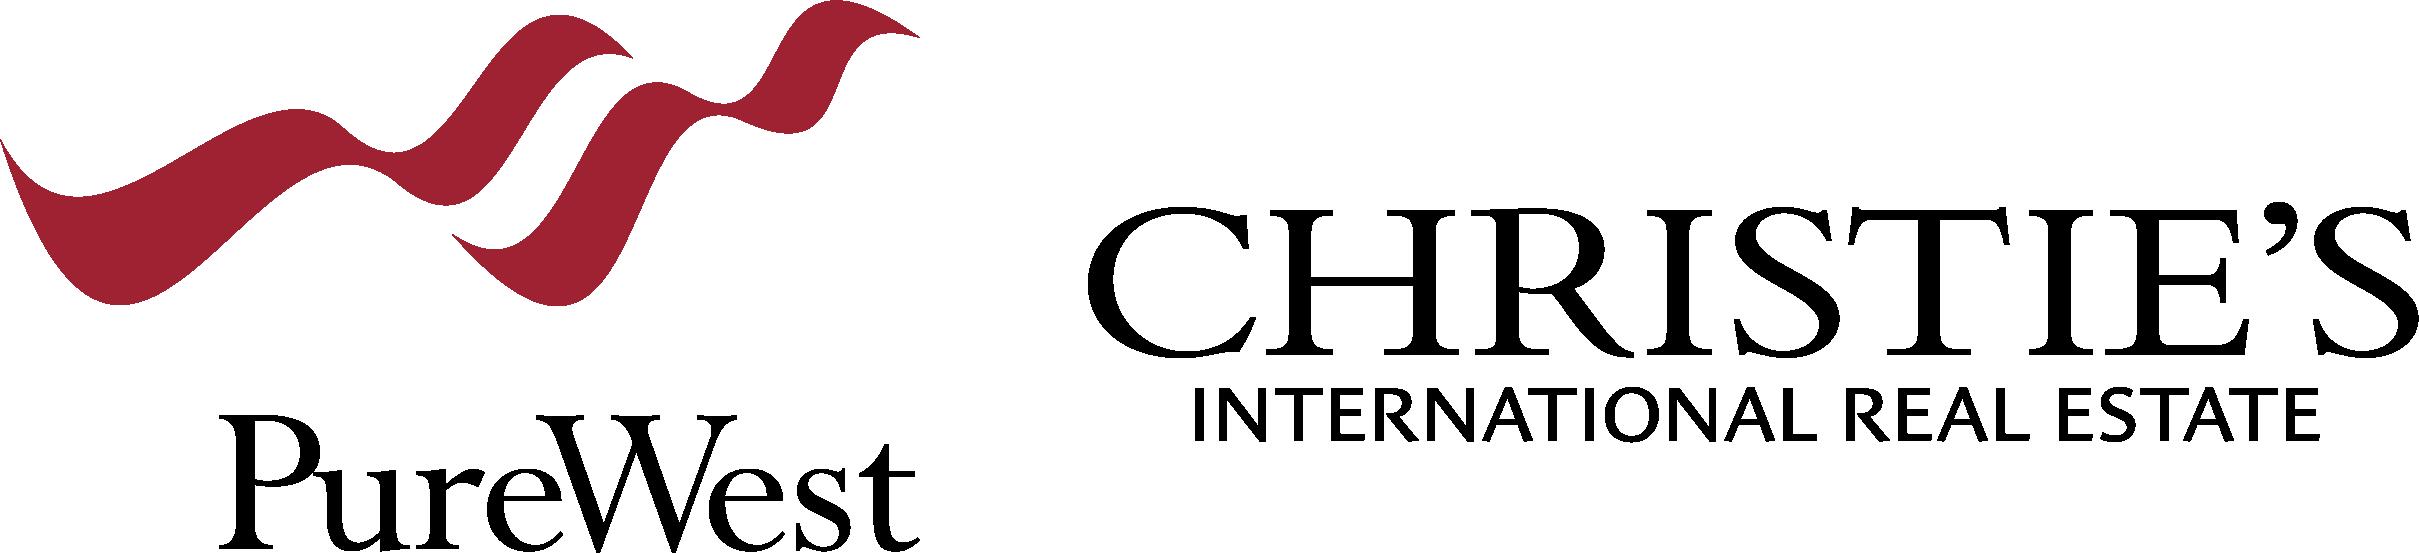 PureWest Christie's International Real Estate Logo